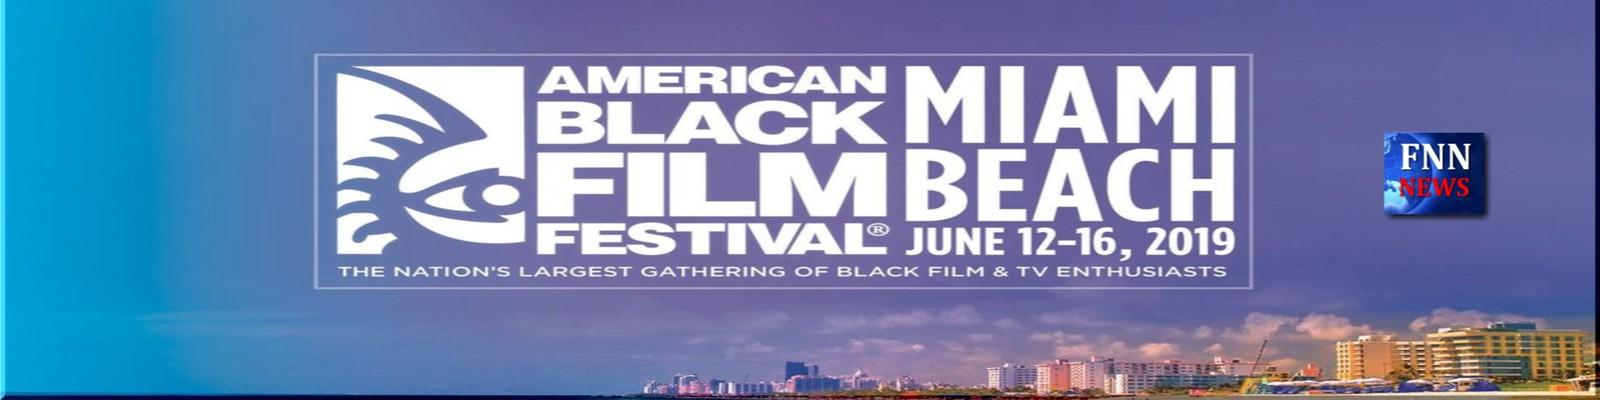 American Black Film Festival, FNN NEWS, Florida National News, Miami Beach